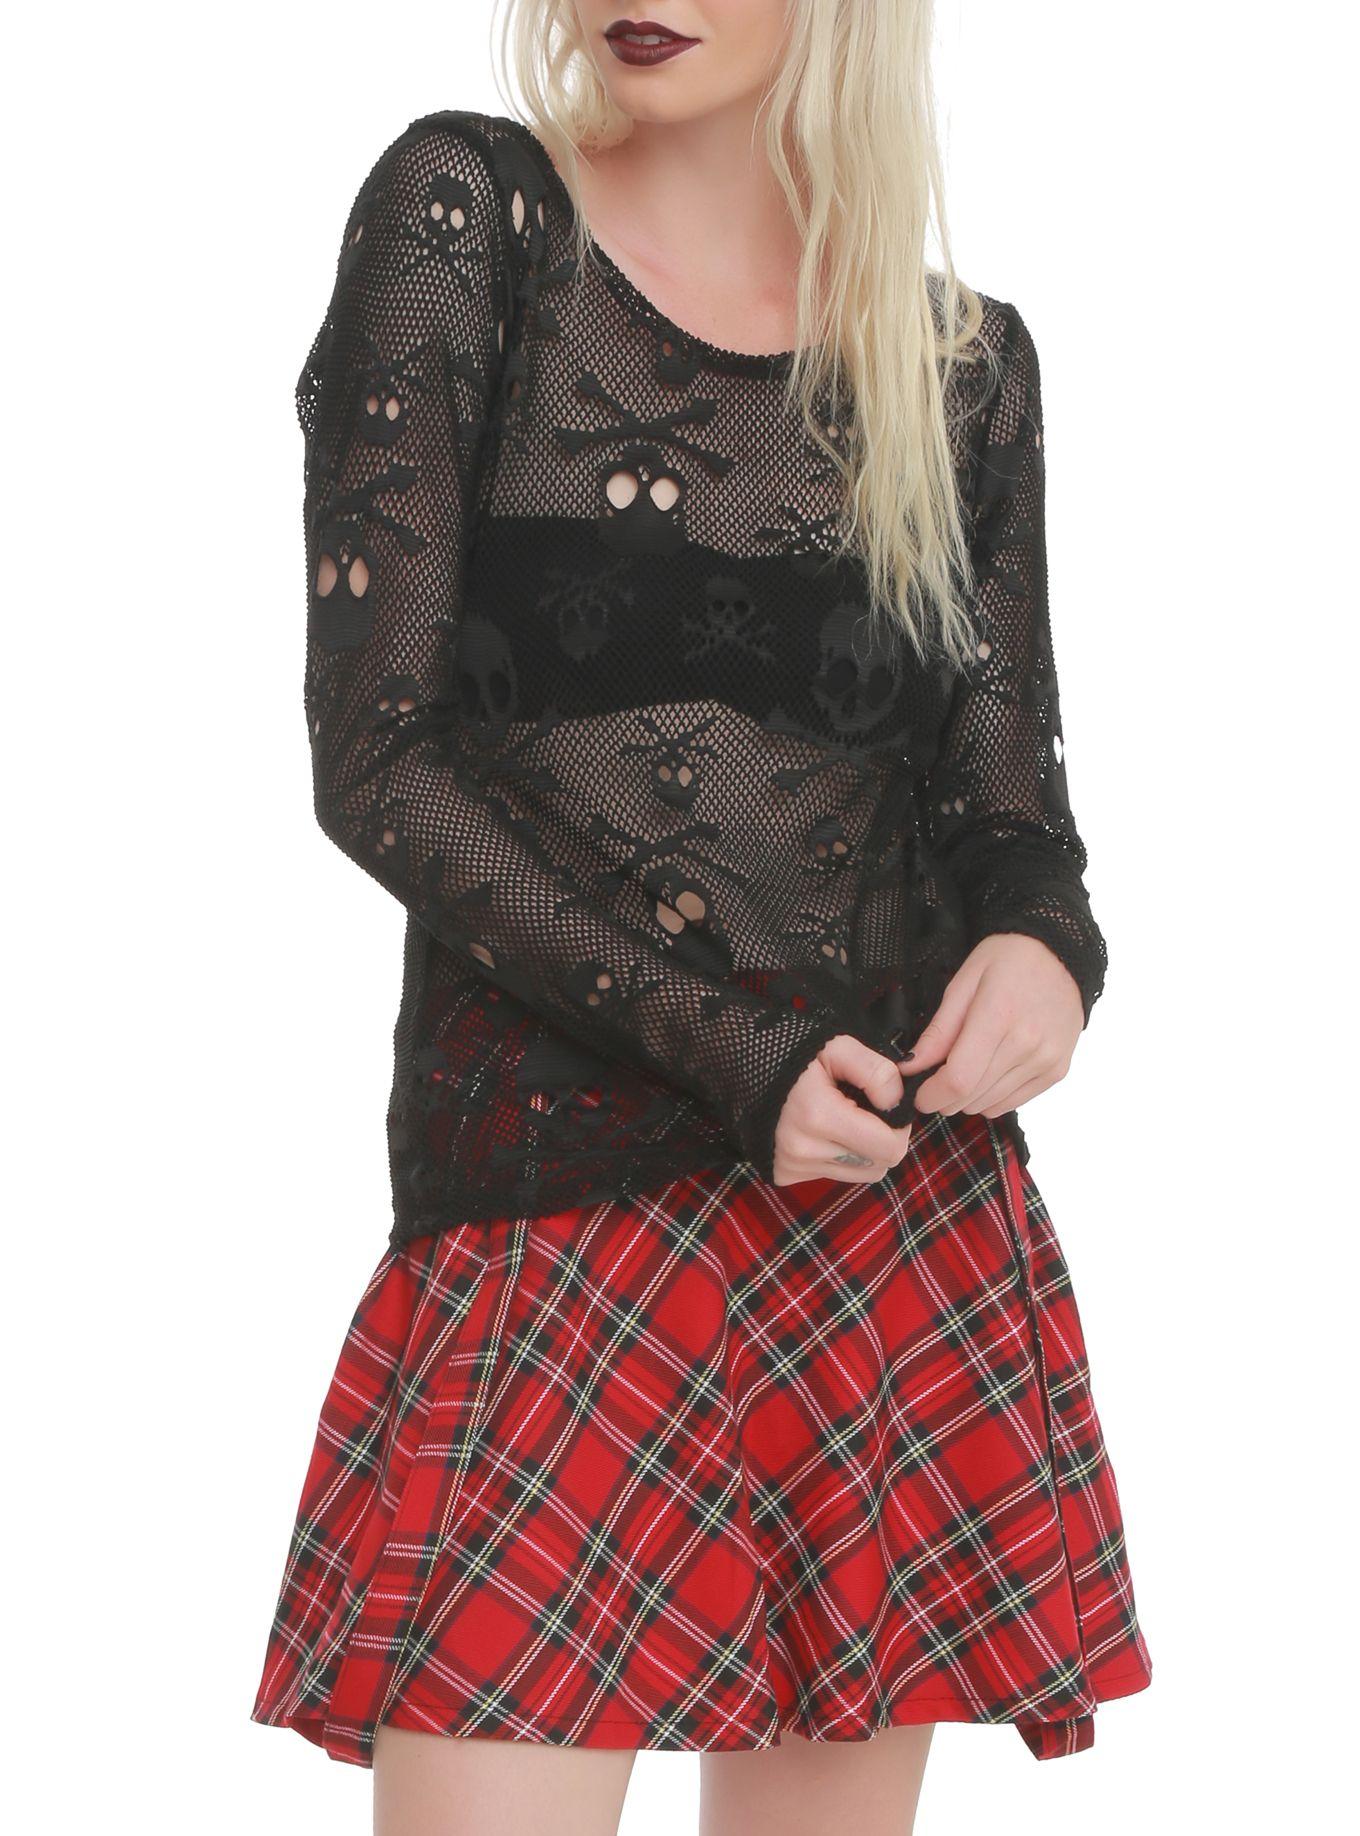 7cd9073090 Royal Bones By Tripp Skull Mesh Top   Gothic Clothing for Women ...